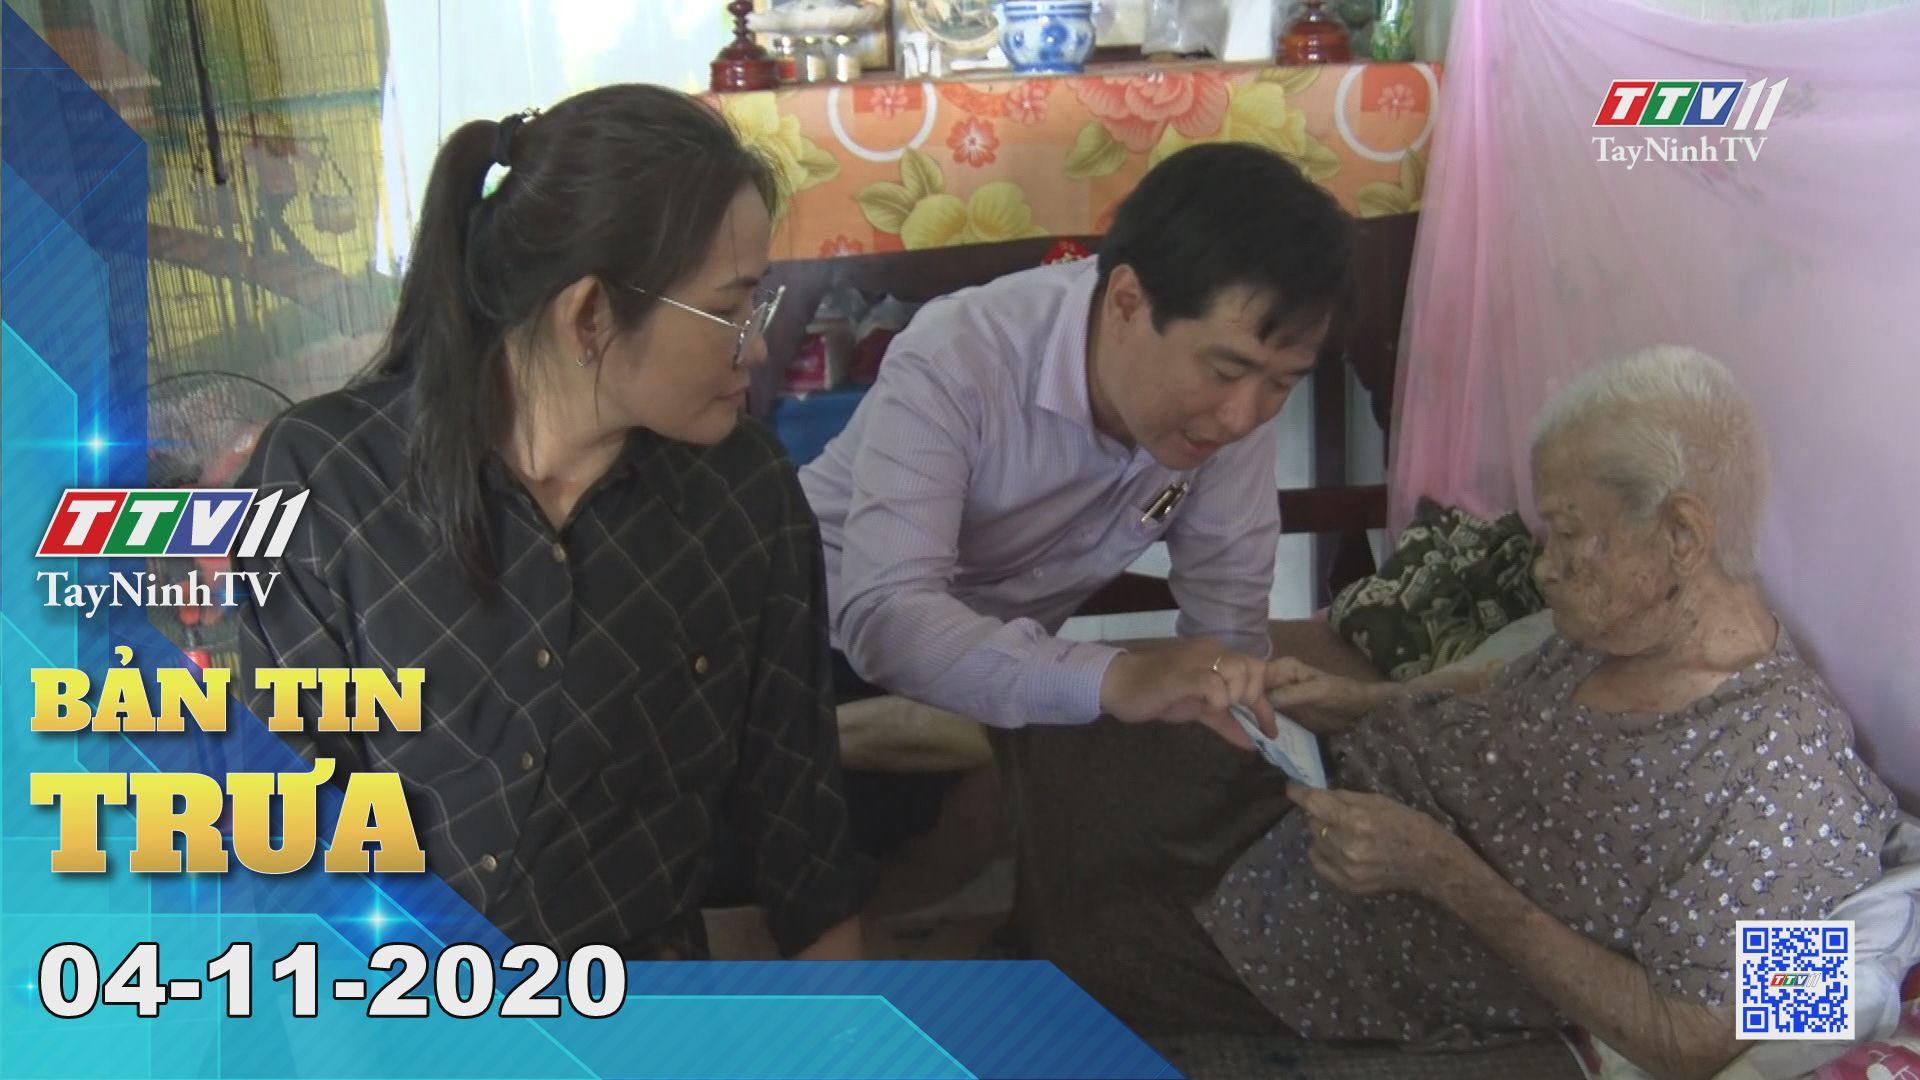 Bản tin trưa 04-11-2020 | Tin tức hôm nay | TayNinhTV